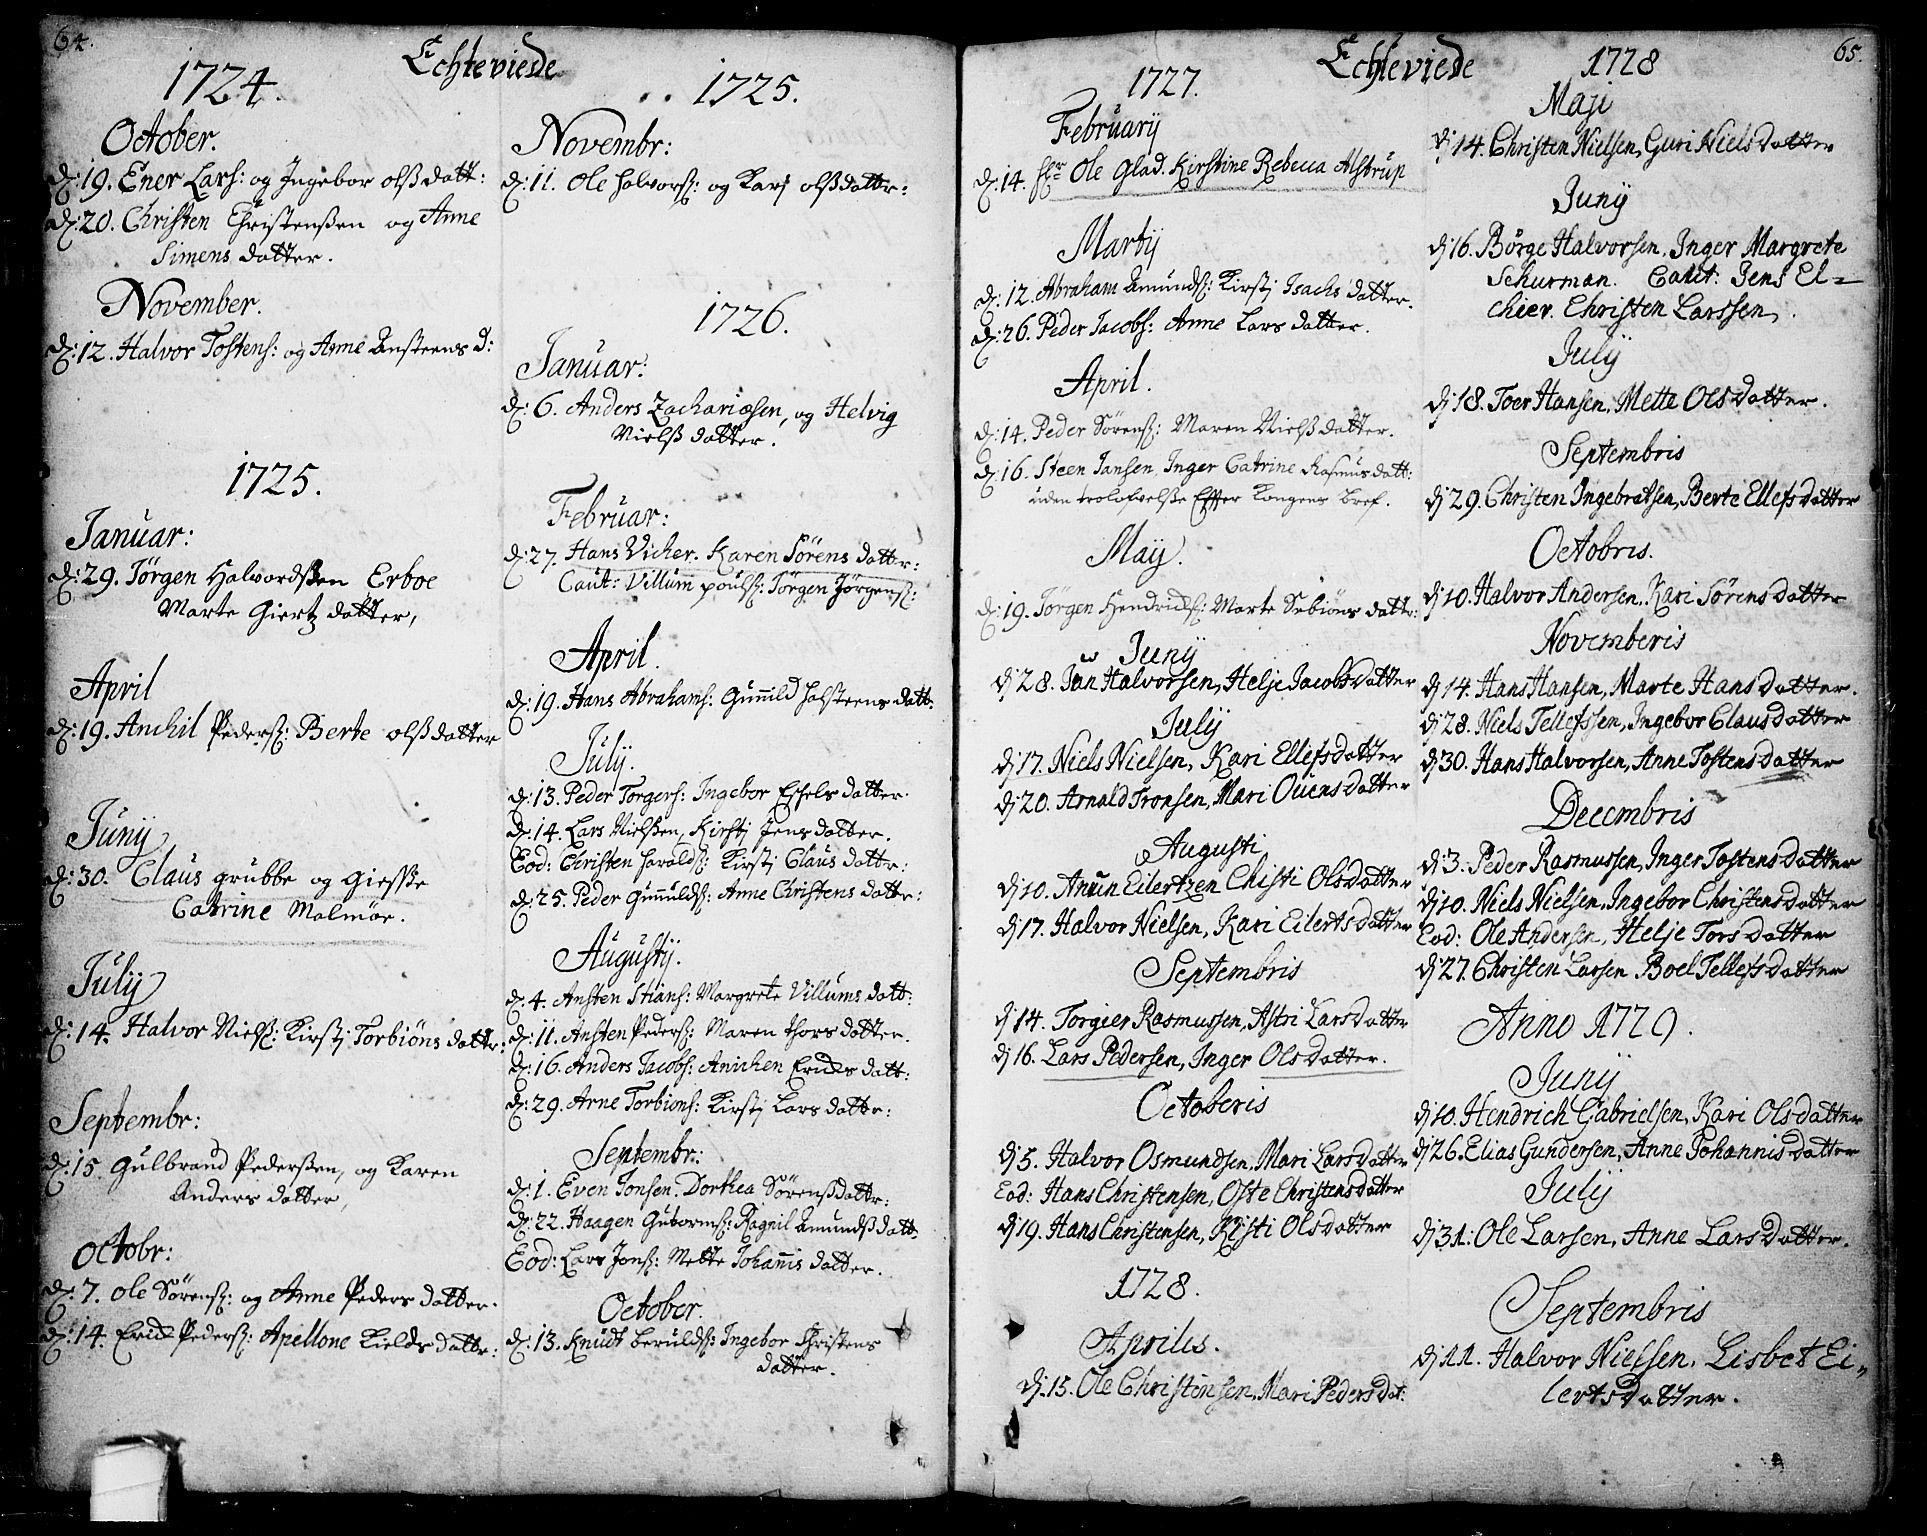 SAKO, Bamble kirkebøker, F/Fa/L0001: Ministerialbok nr. I 1, 1702-1774, s. 64-65